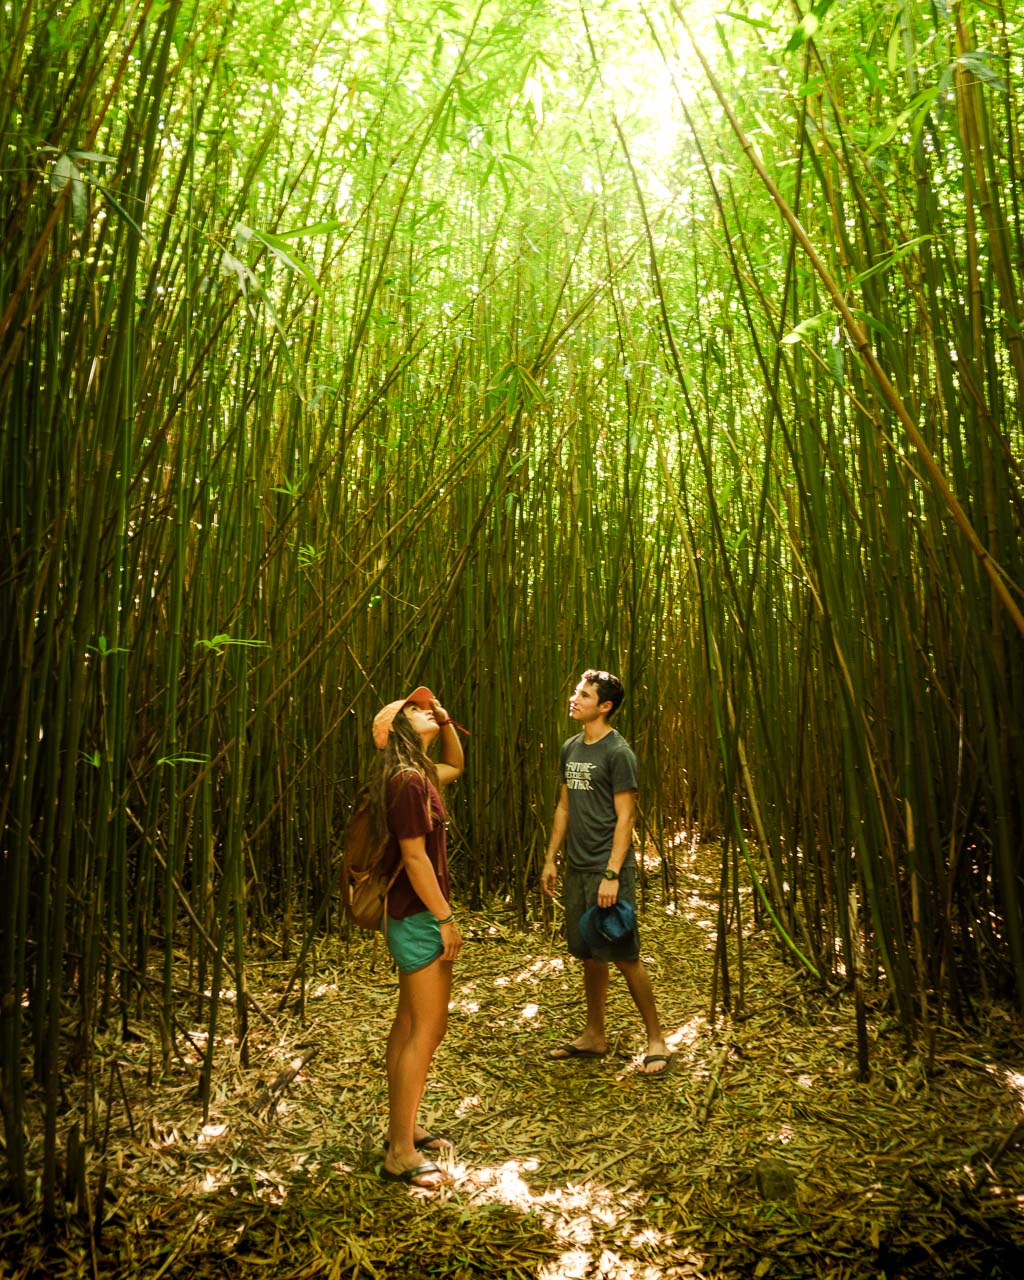 Bamboo Forest, Road to Hana, Maui